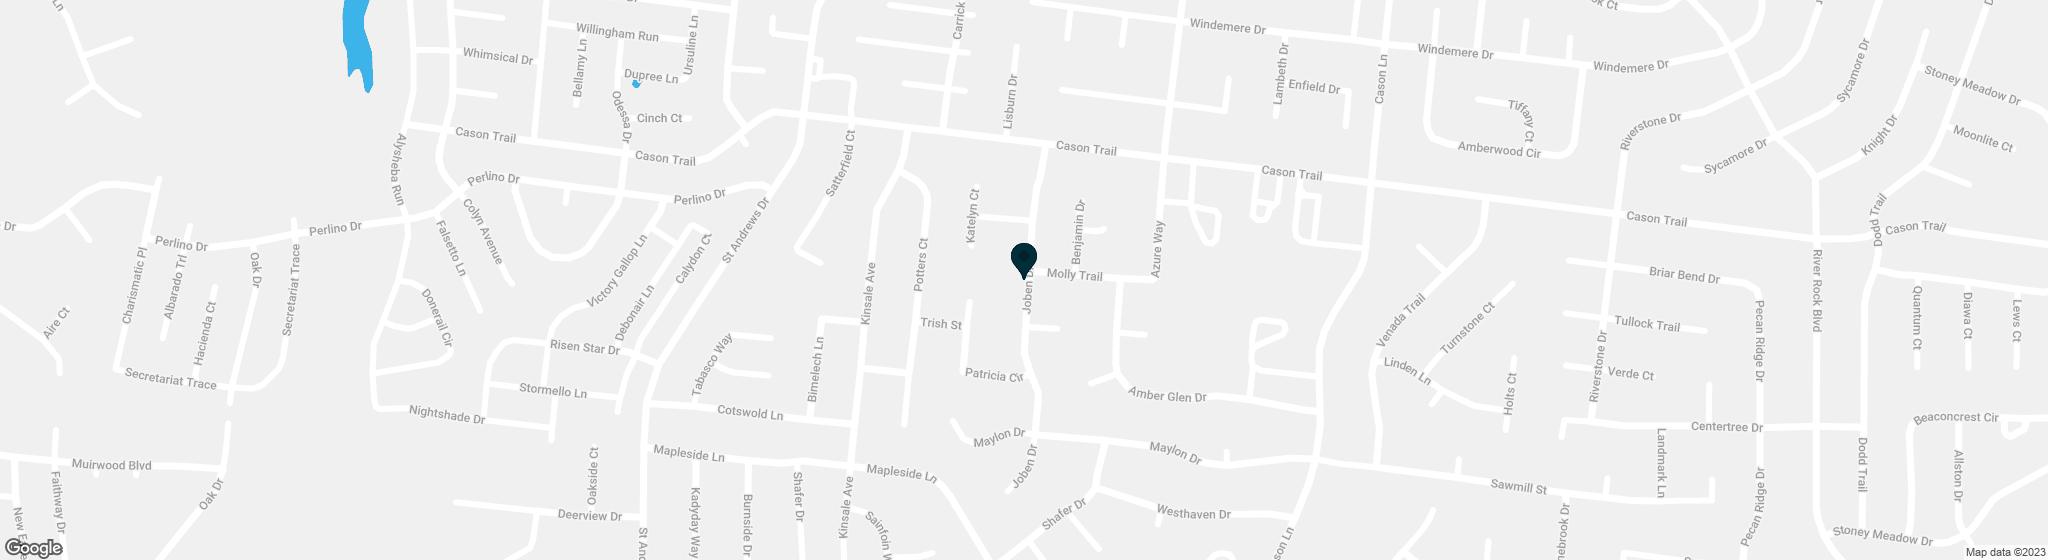 405 Davenport Drive Lot 14 Murfreesboro TN 37128